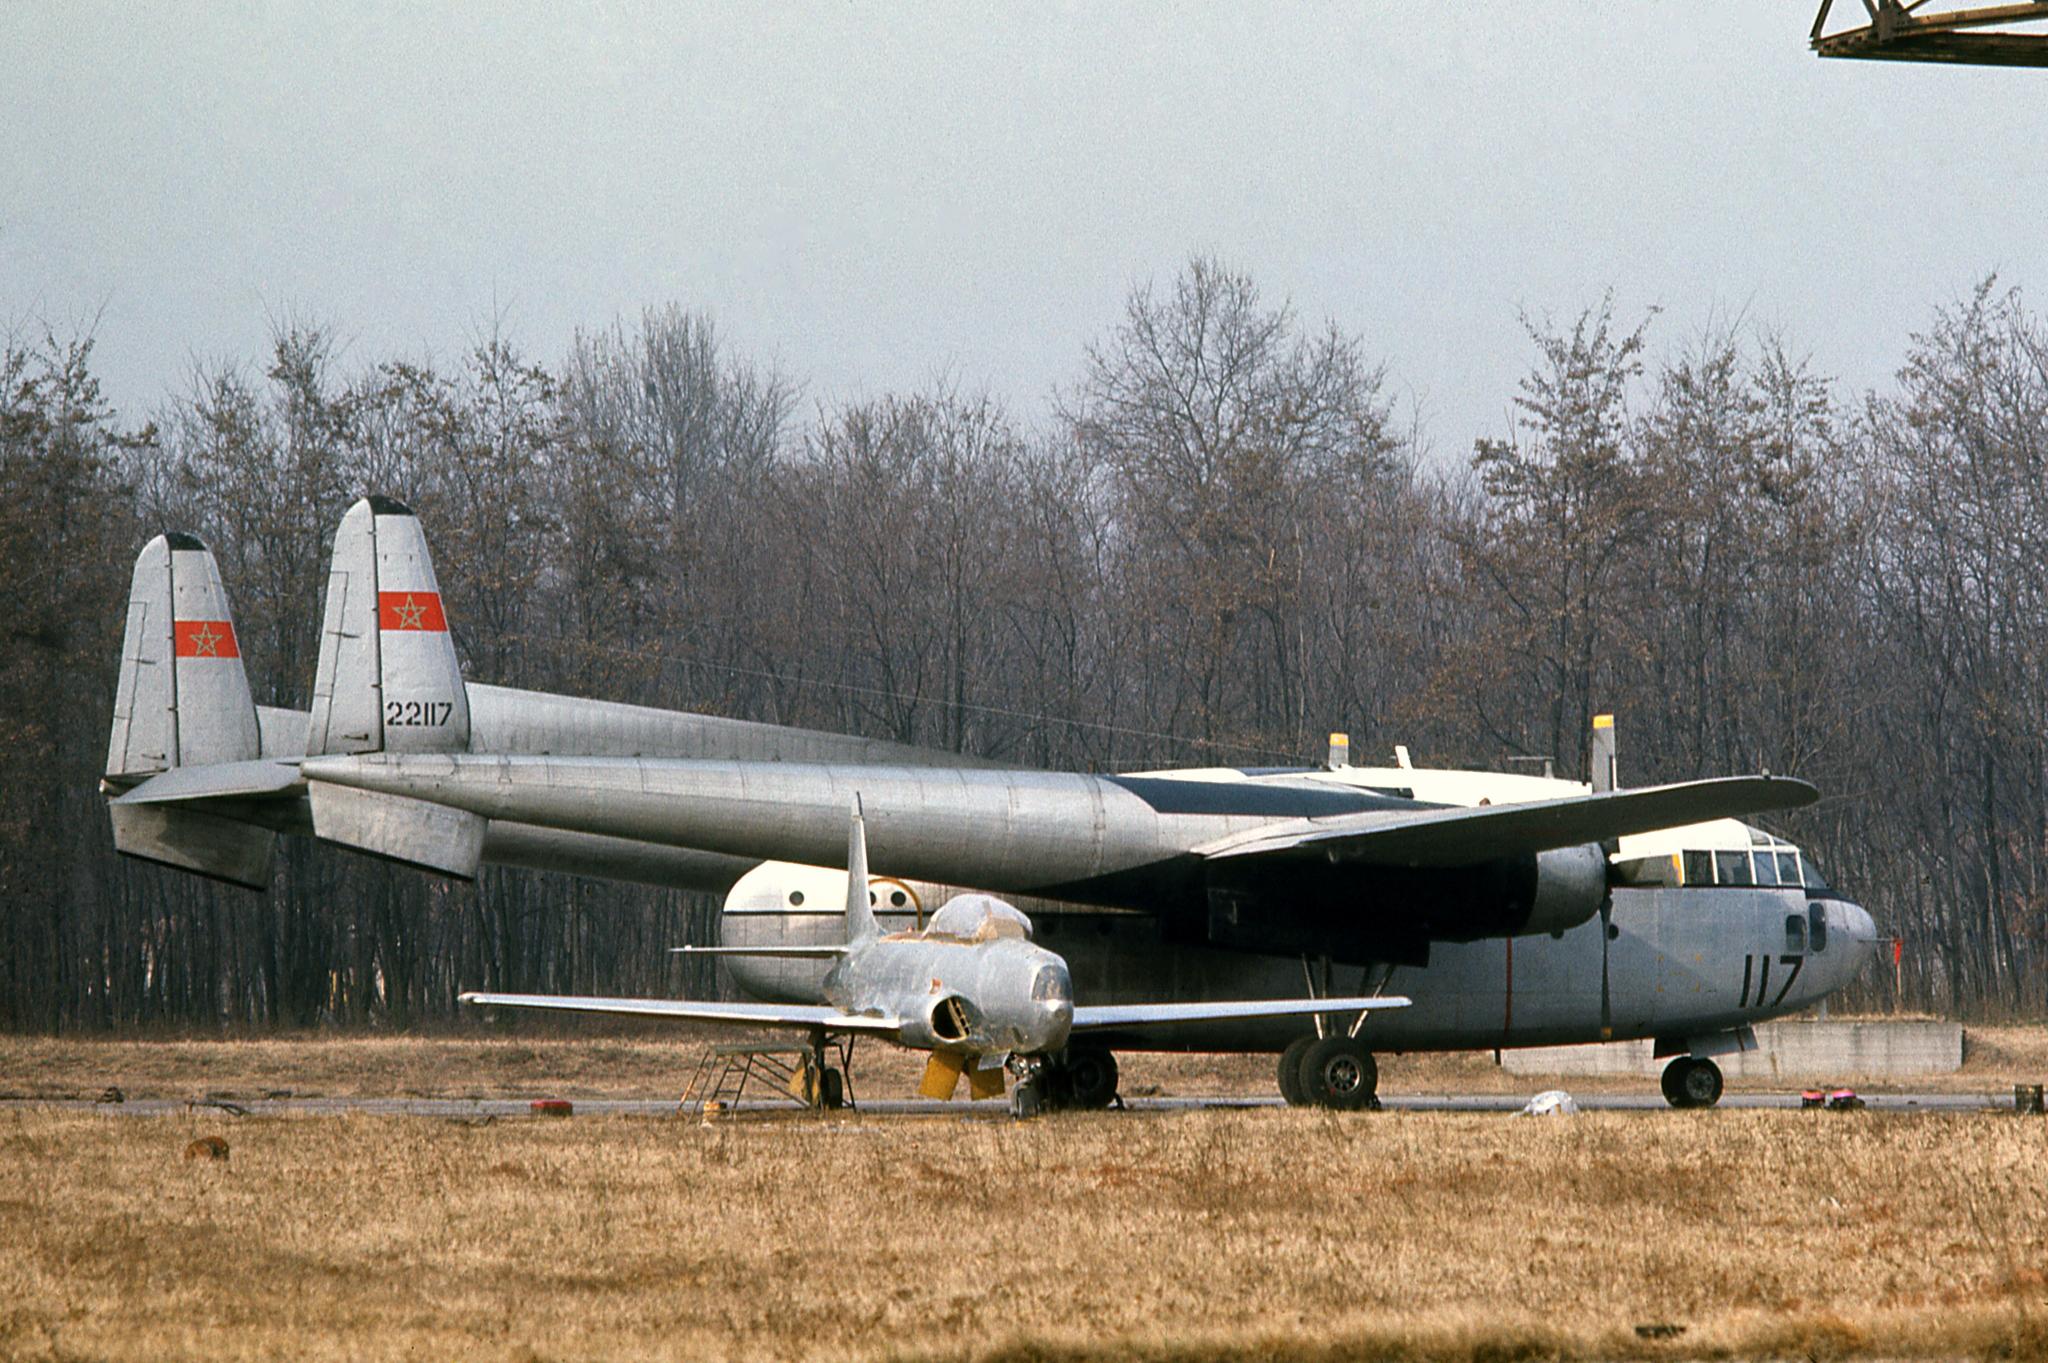 FRA: Photos anciens avions des FRA - Page 12 46408669775_1456facd54_o